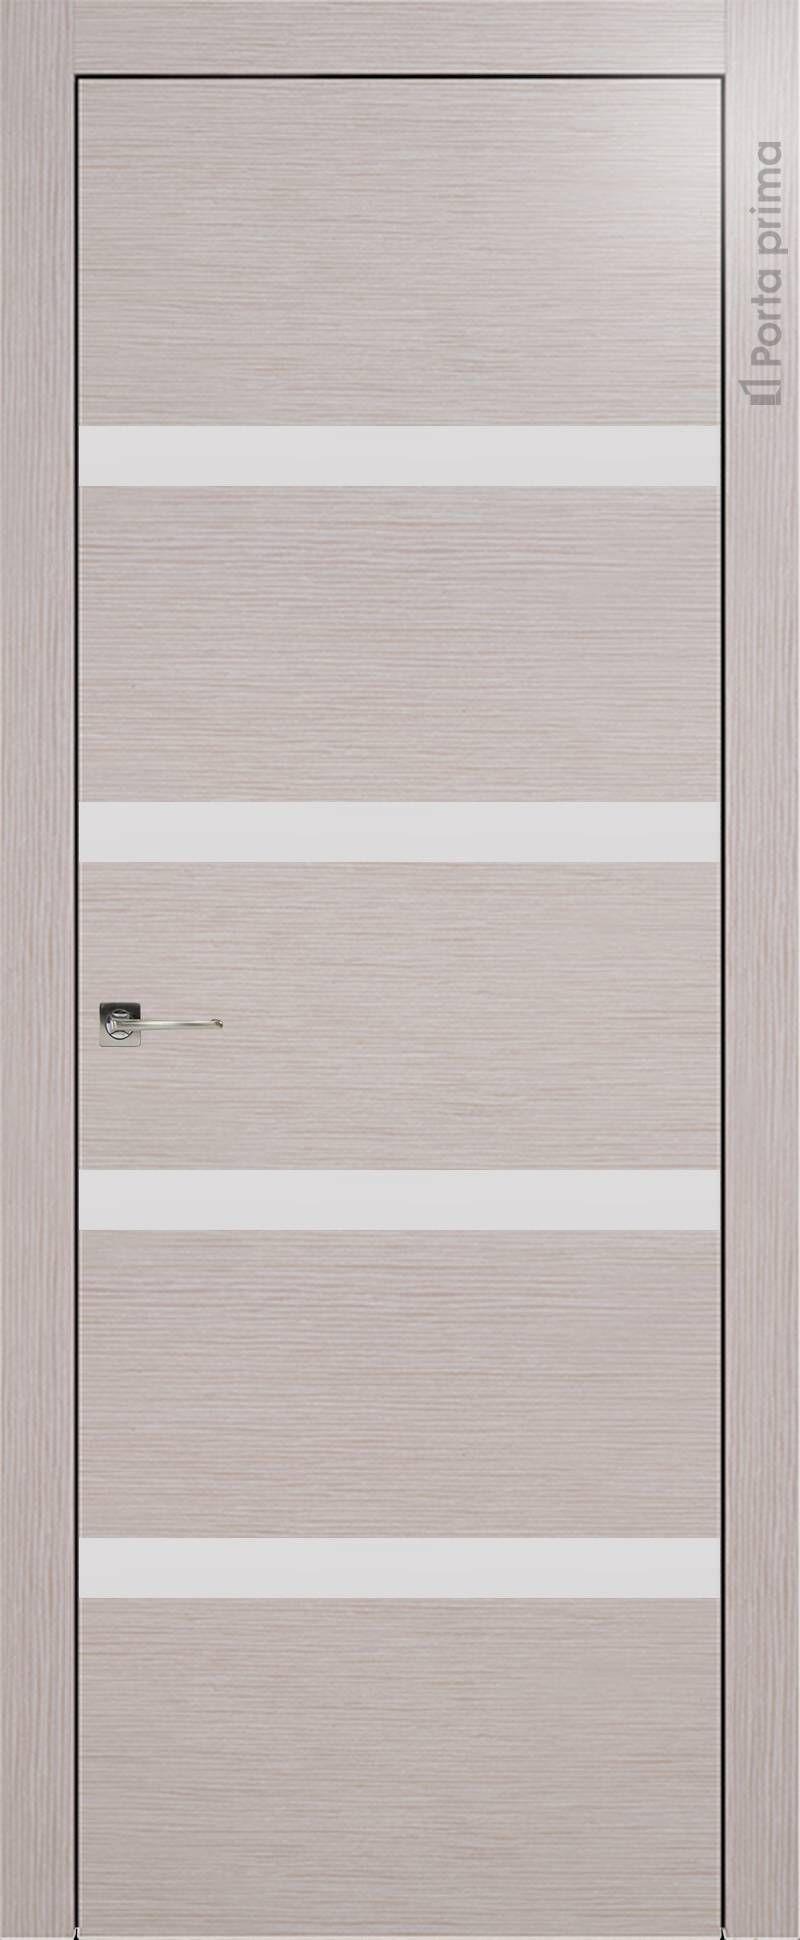 Tivoli Д-4 цвет - Дымчатый дуб Без стекла (ДГ)